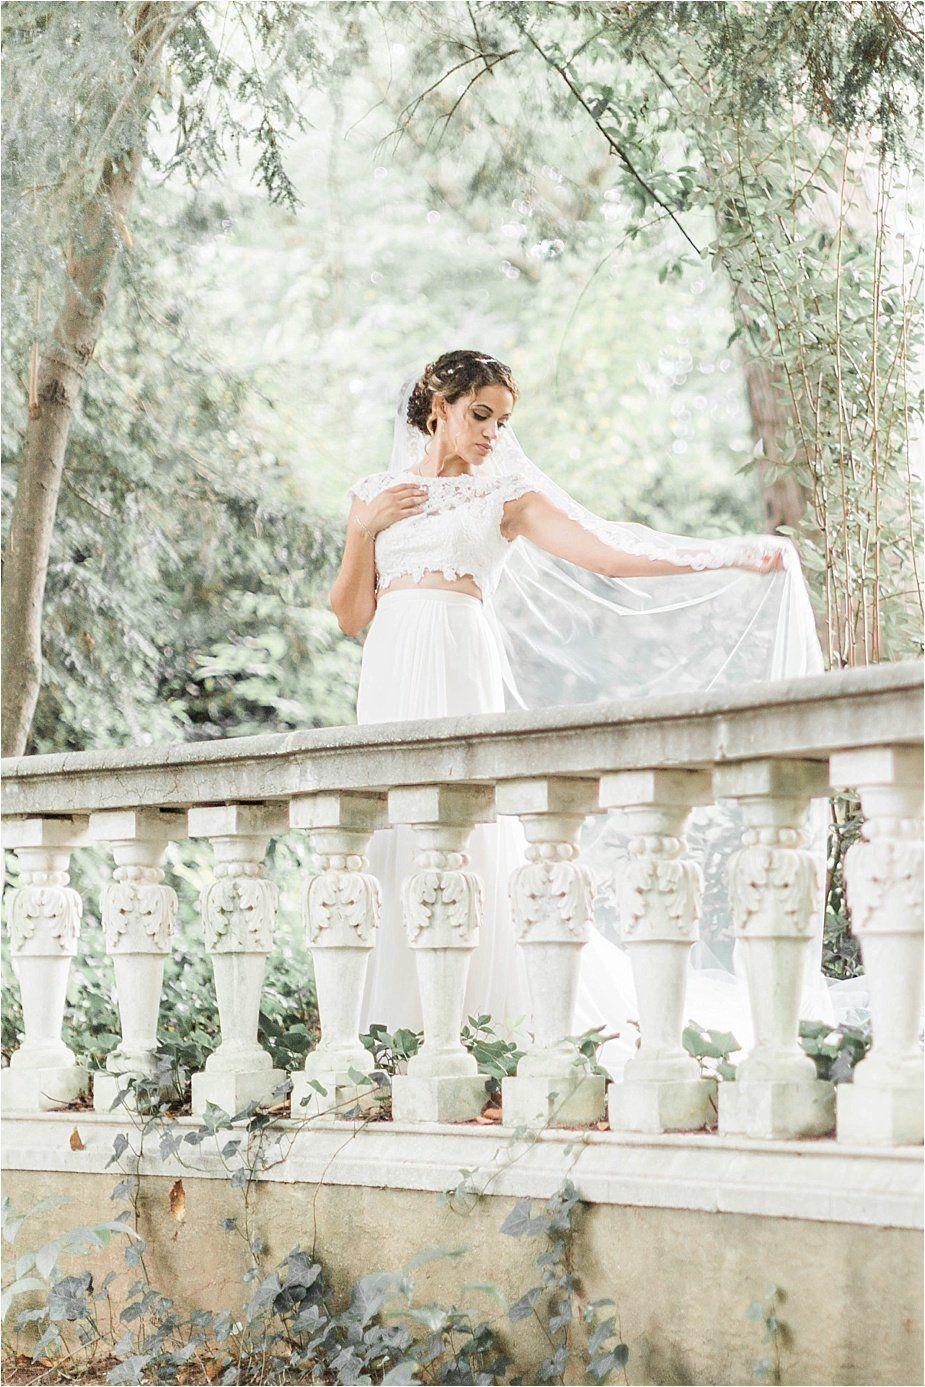 WEDDING PHOTOGRAPHER FOR SOUTHEAST US WEDDINGS